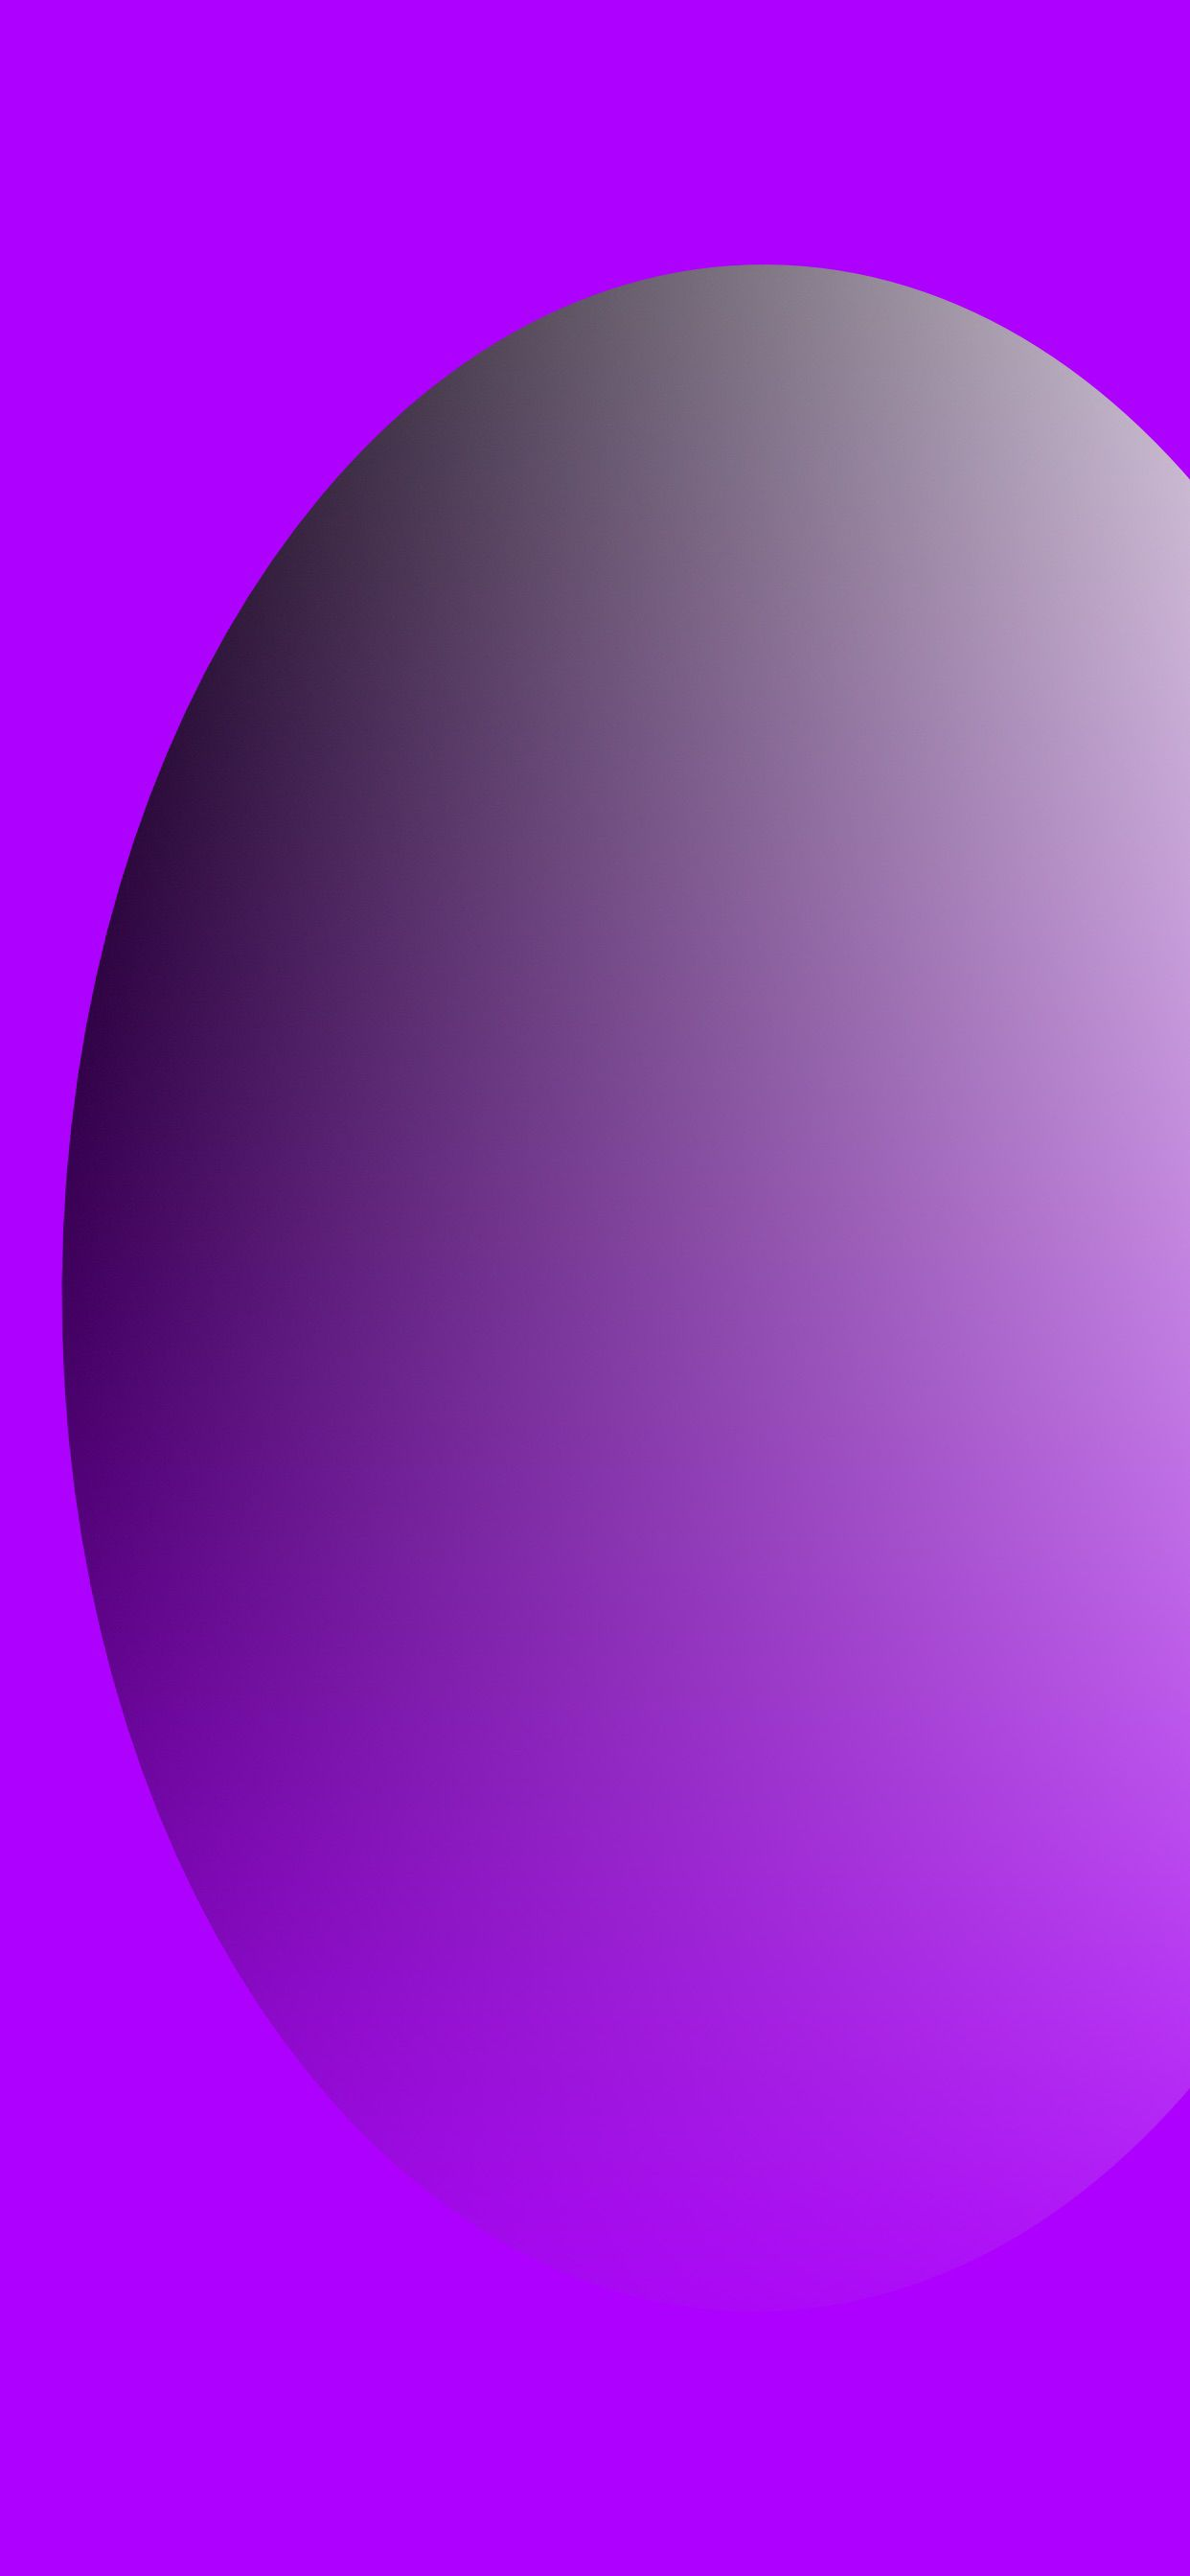 Gradient Phone Wallpaper Designed By ©Hotspot4U iPhone